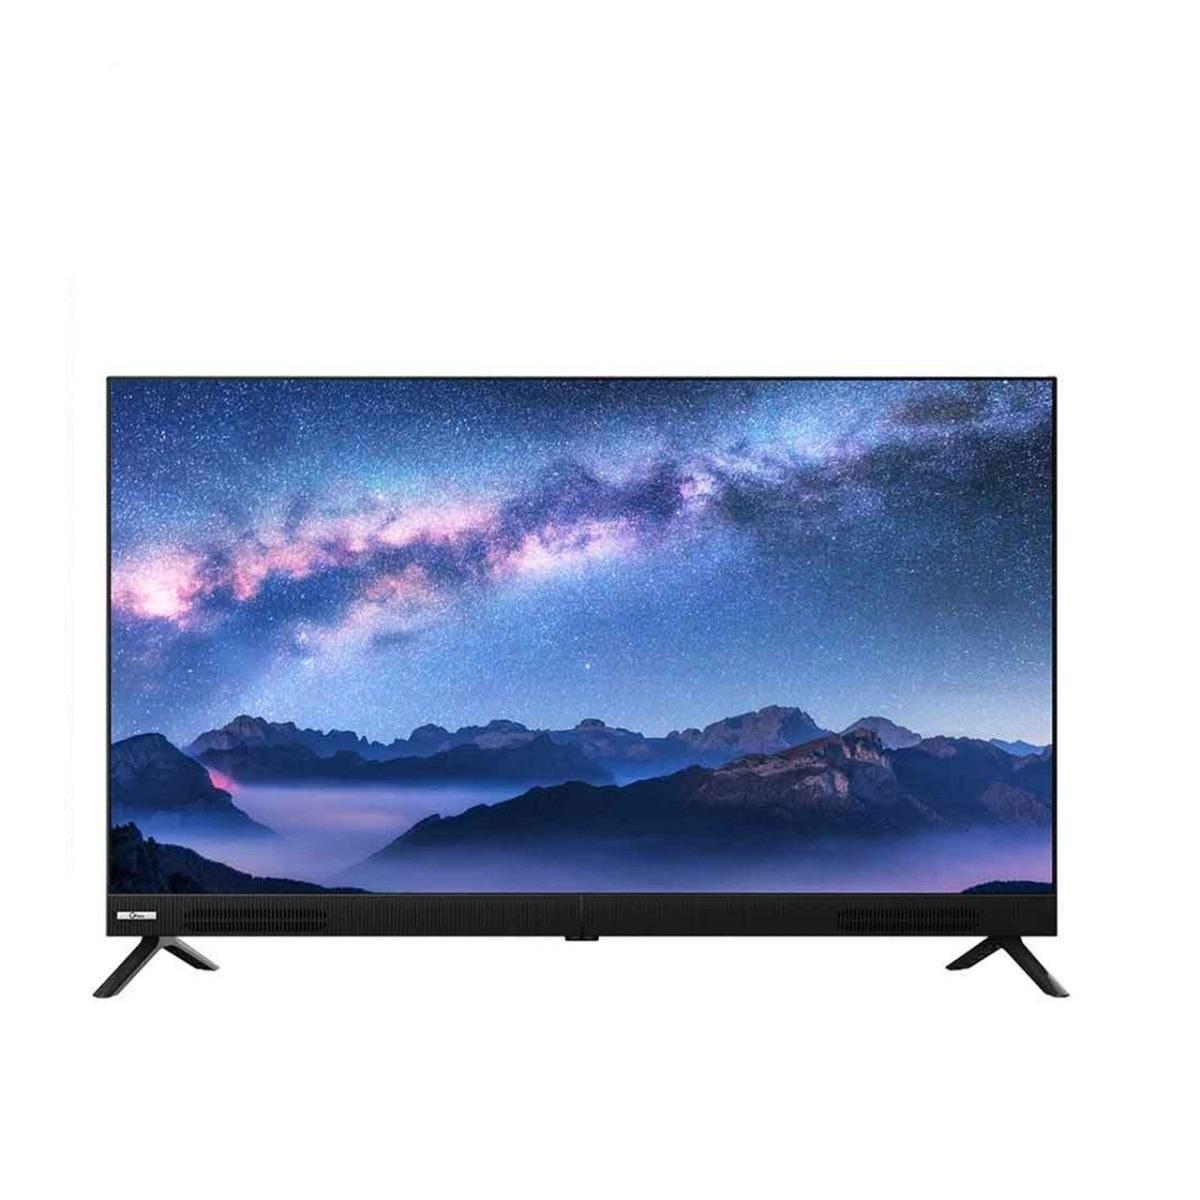 تلویزیون 40 اینچ ال ای دی هوشمند جی پلاس مدل GTV-40KH612N